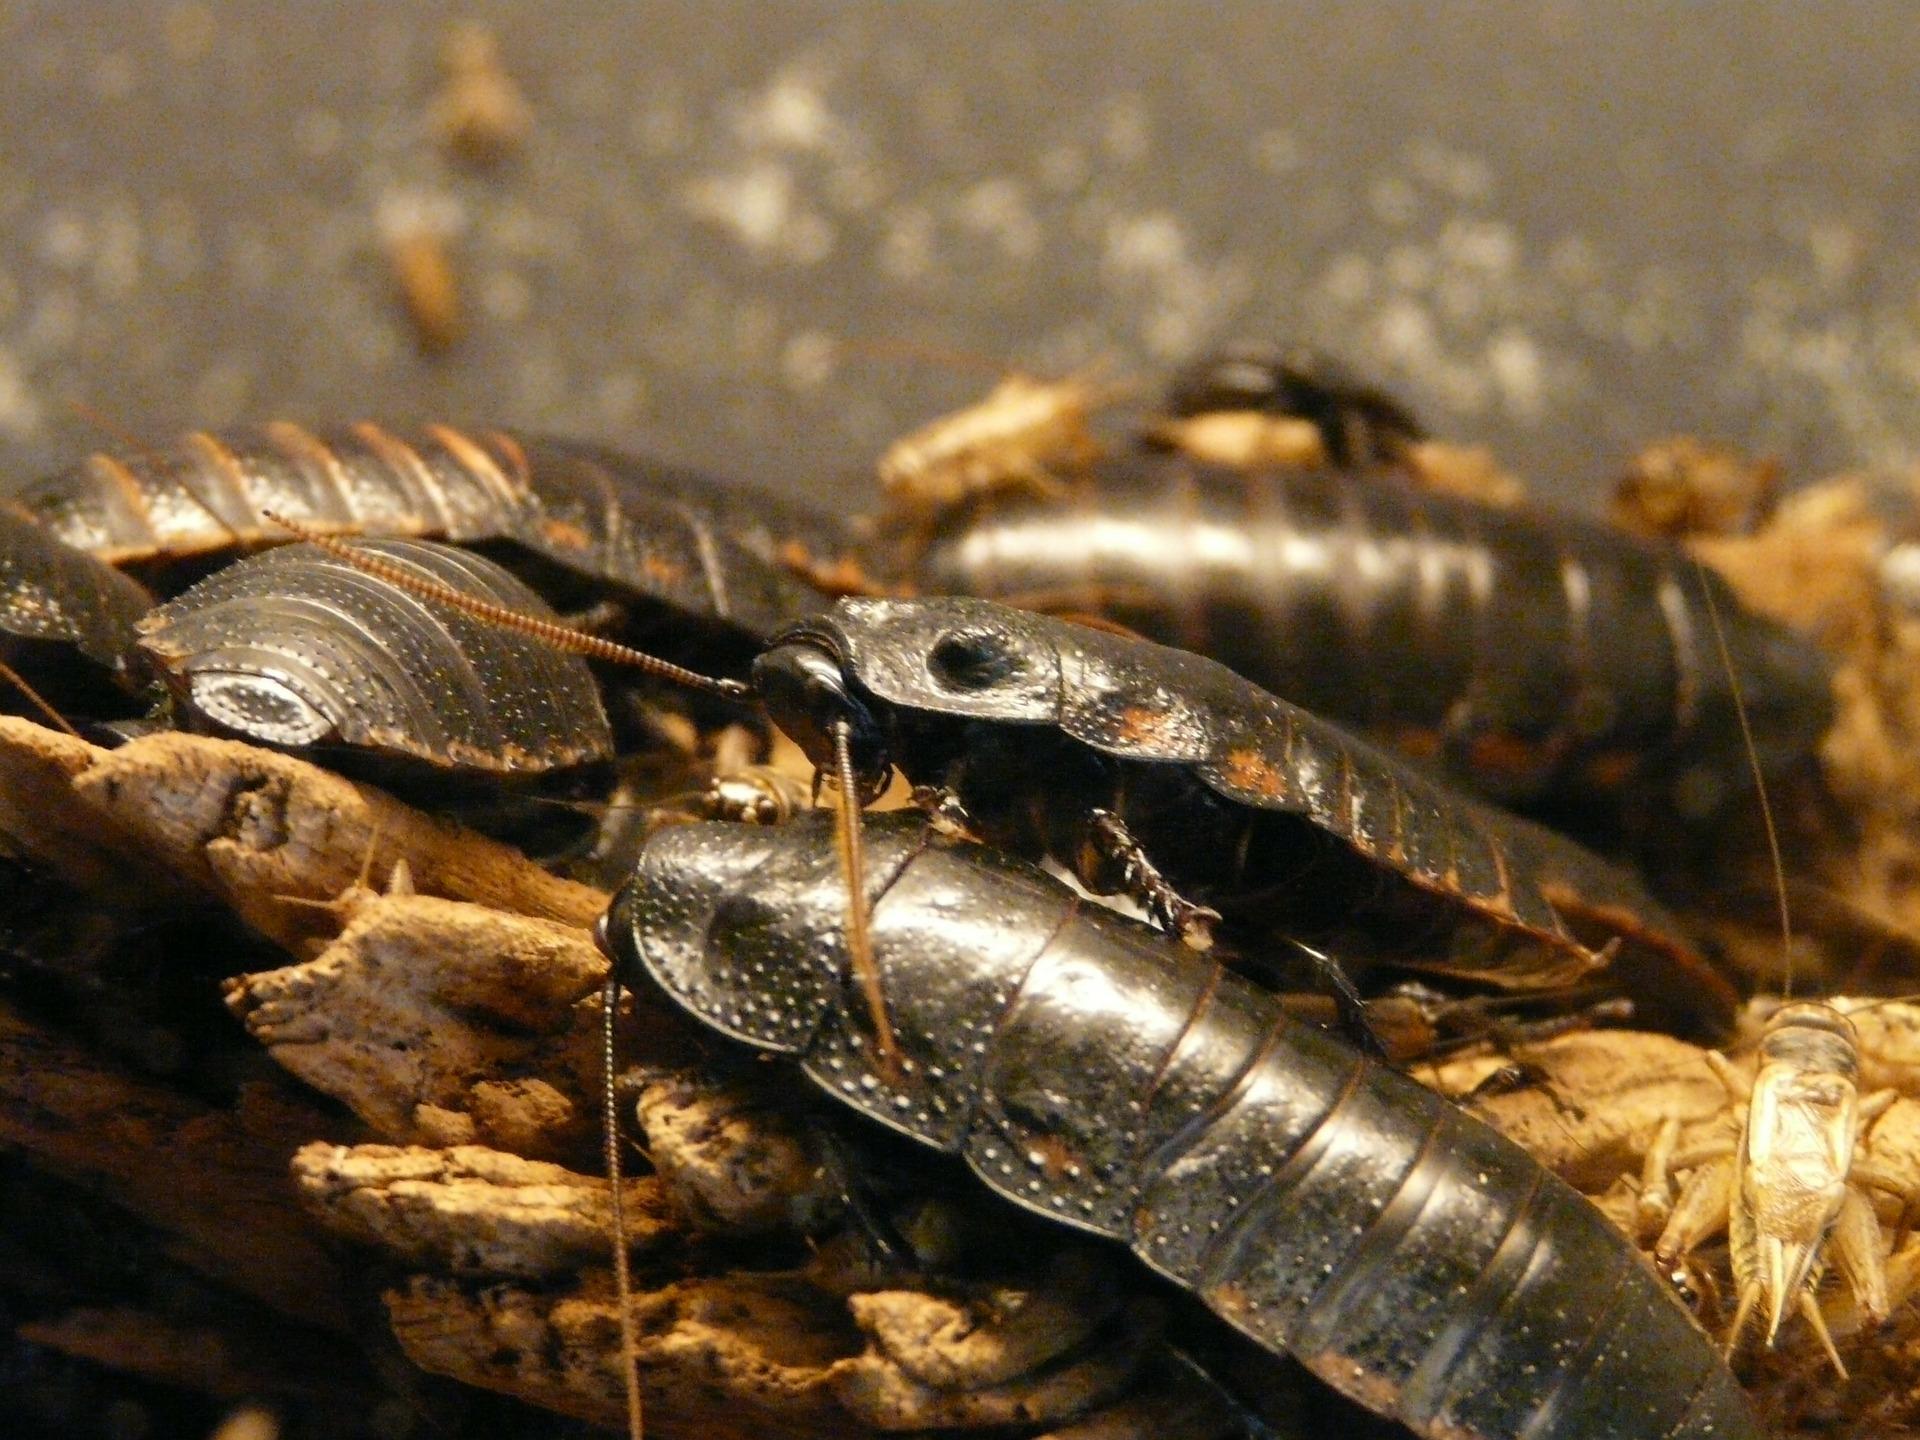 Cockroach Colony, Social Cockroaches